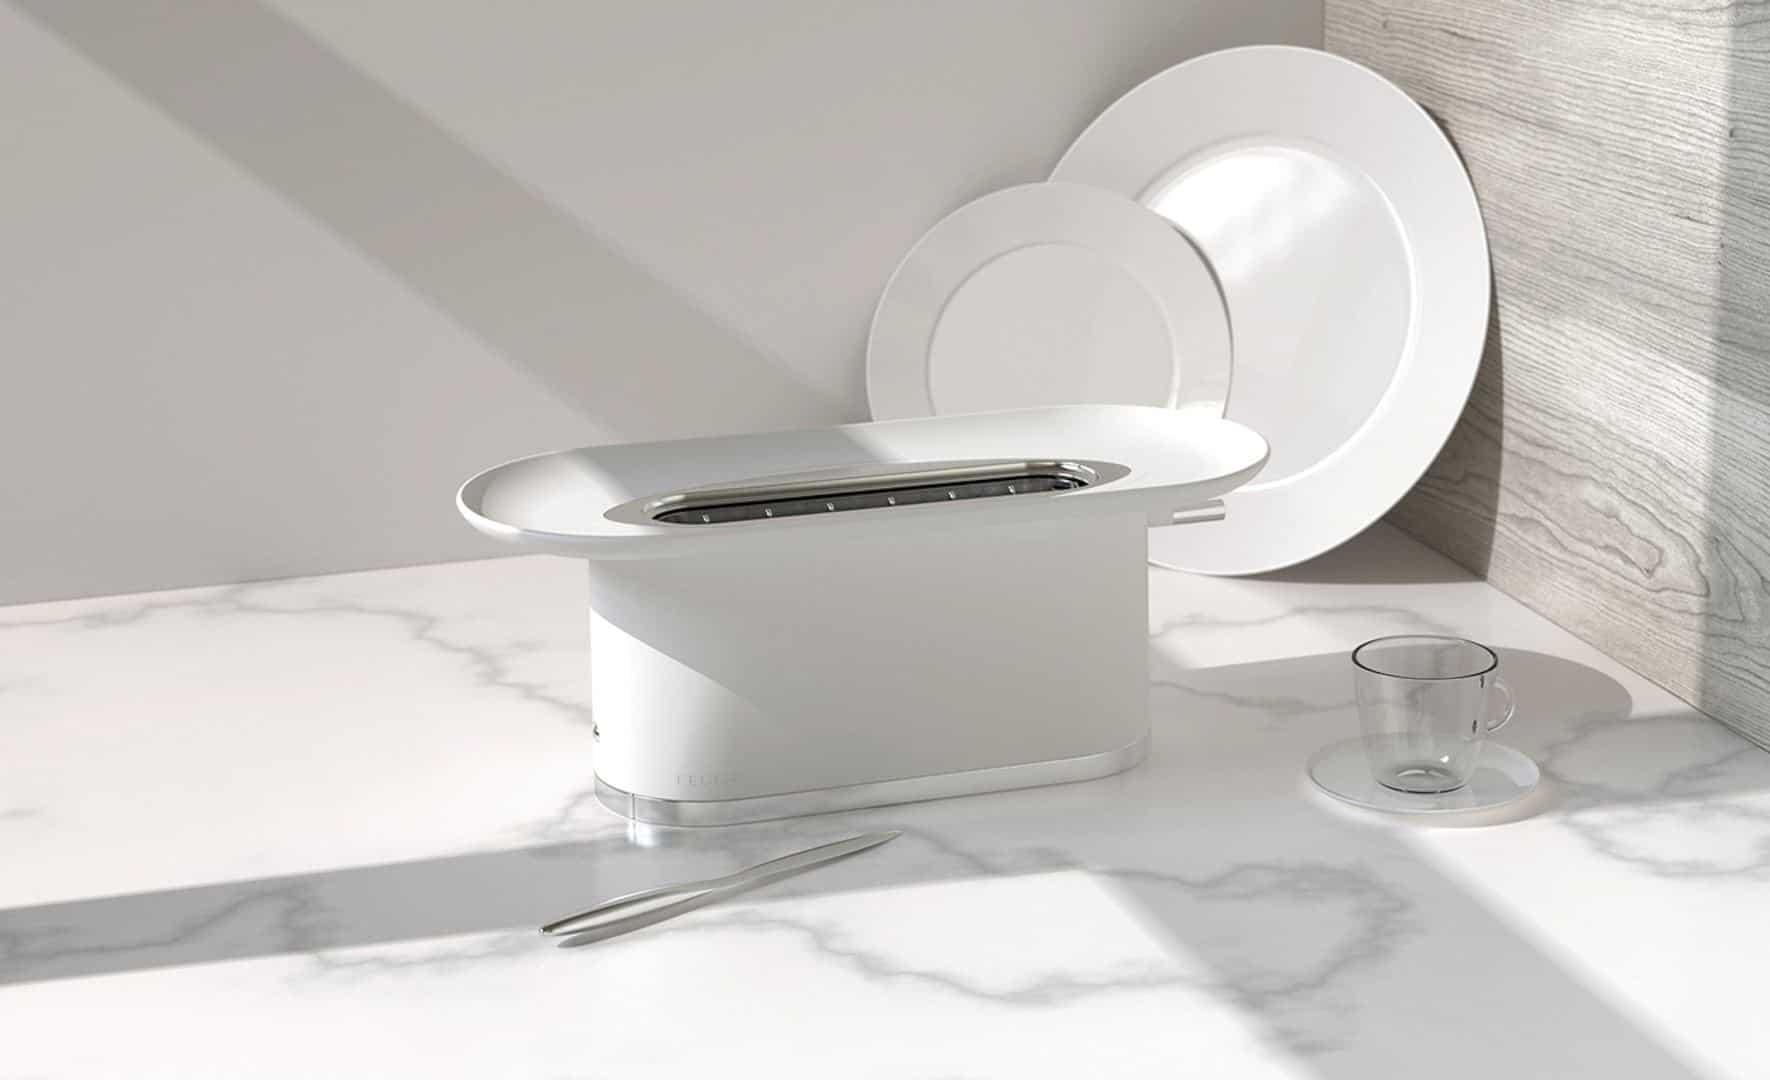 Fedora Toaster 11